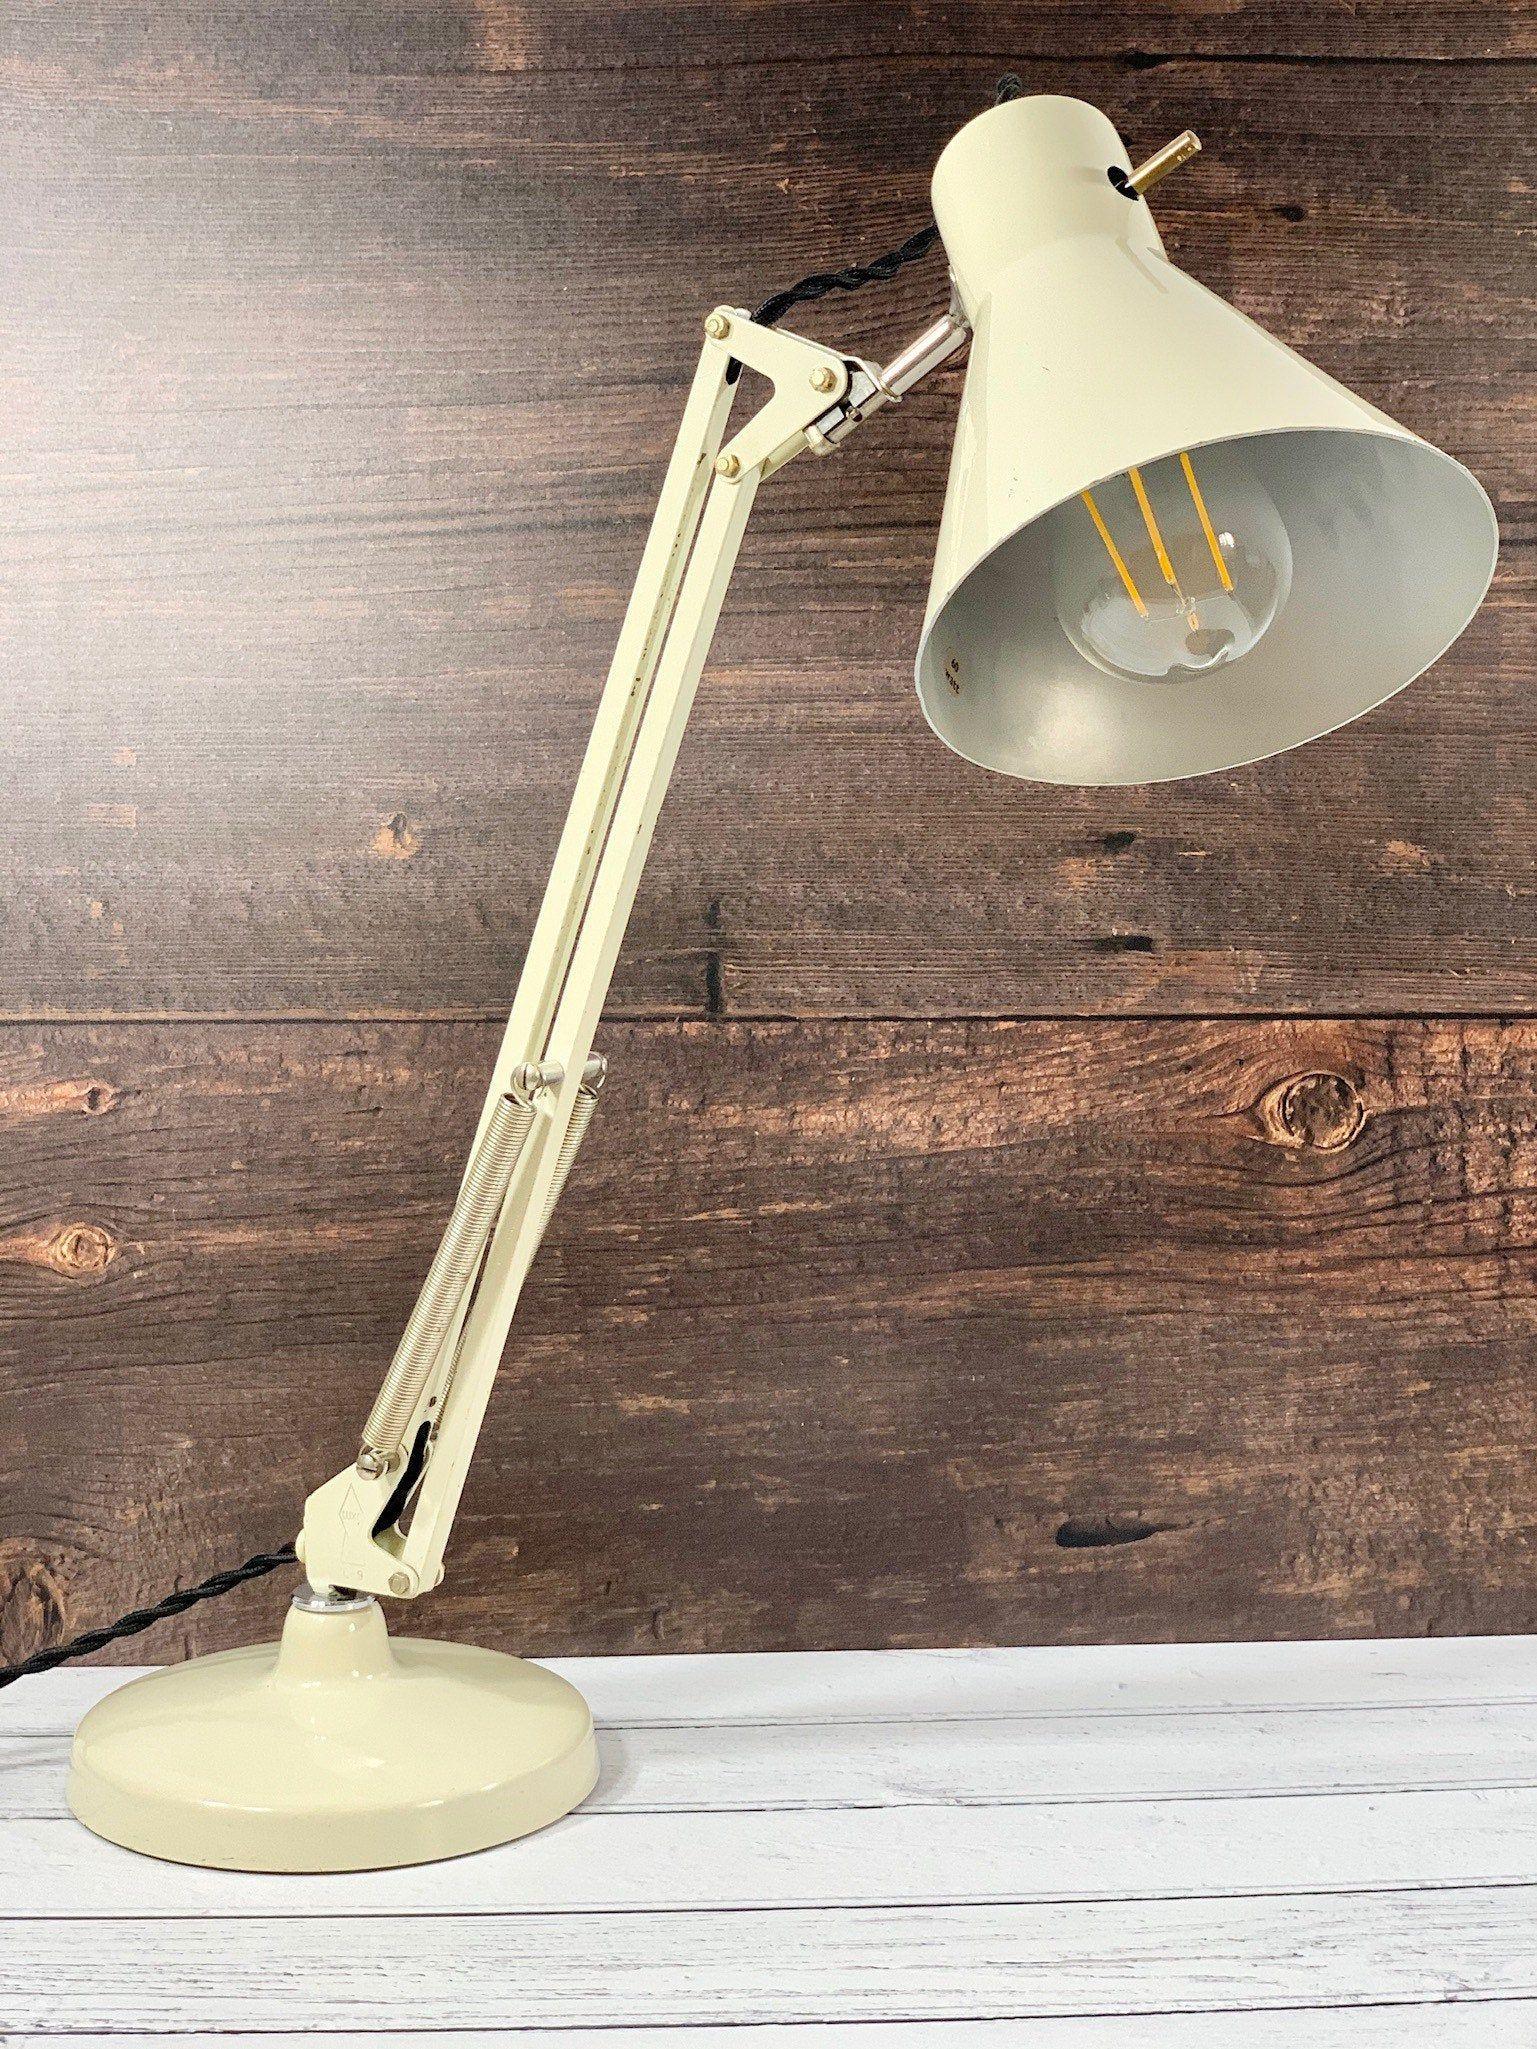 Louis Poulsen Danish Desk Office Lamp Arkitekt Retro Anglepoise Style Scandinavian Design In 2020 Anglepoise Anglepoise Lamp Clamp Lamp